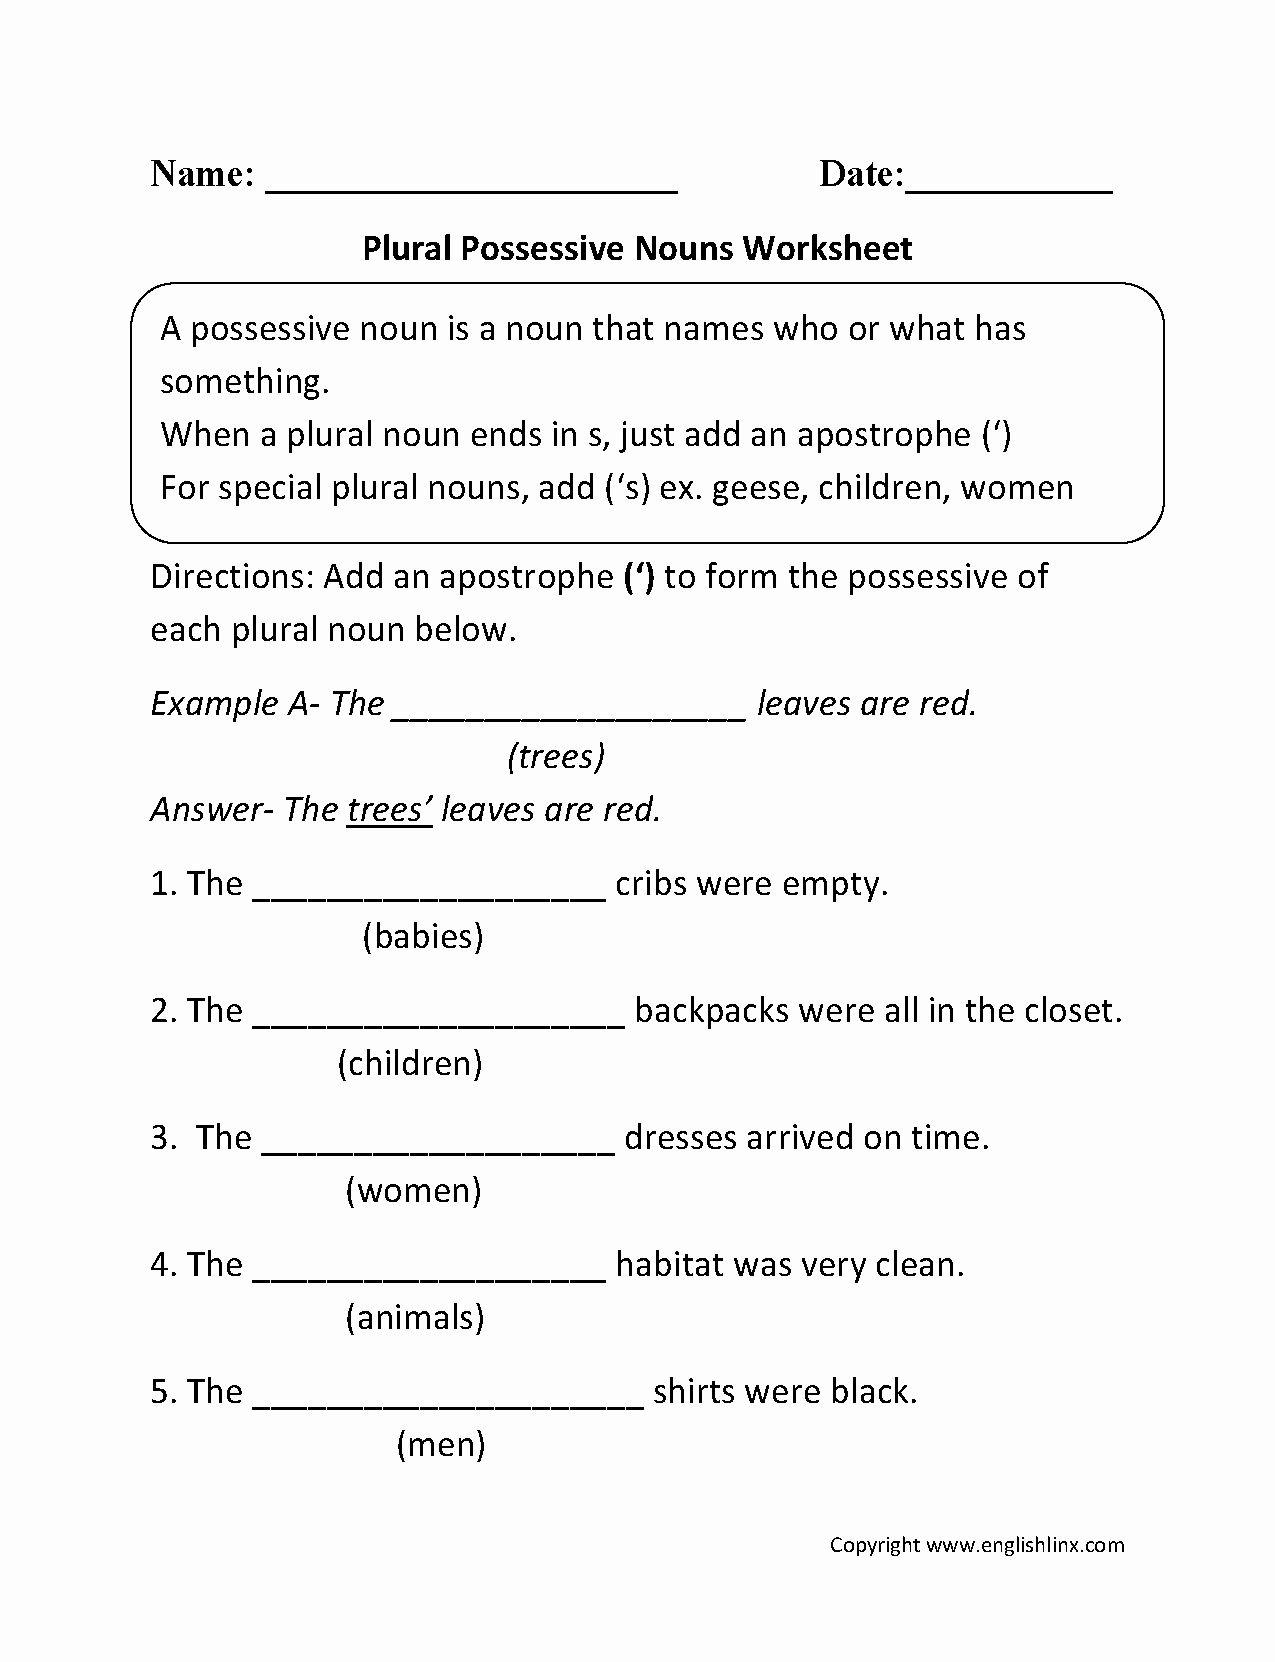 Singular Possessive Nouns Worksheet Luxury Plural Noun